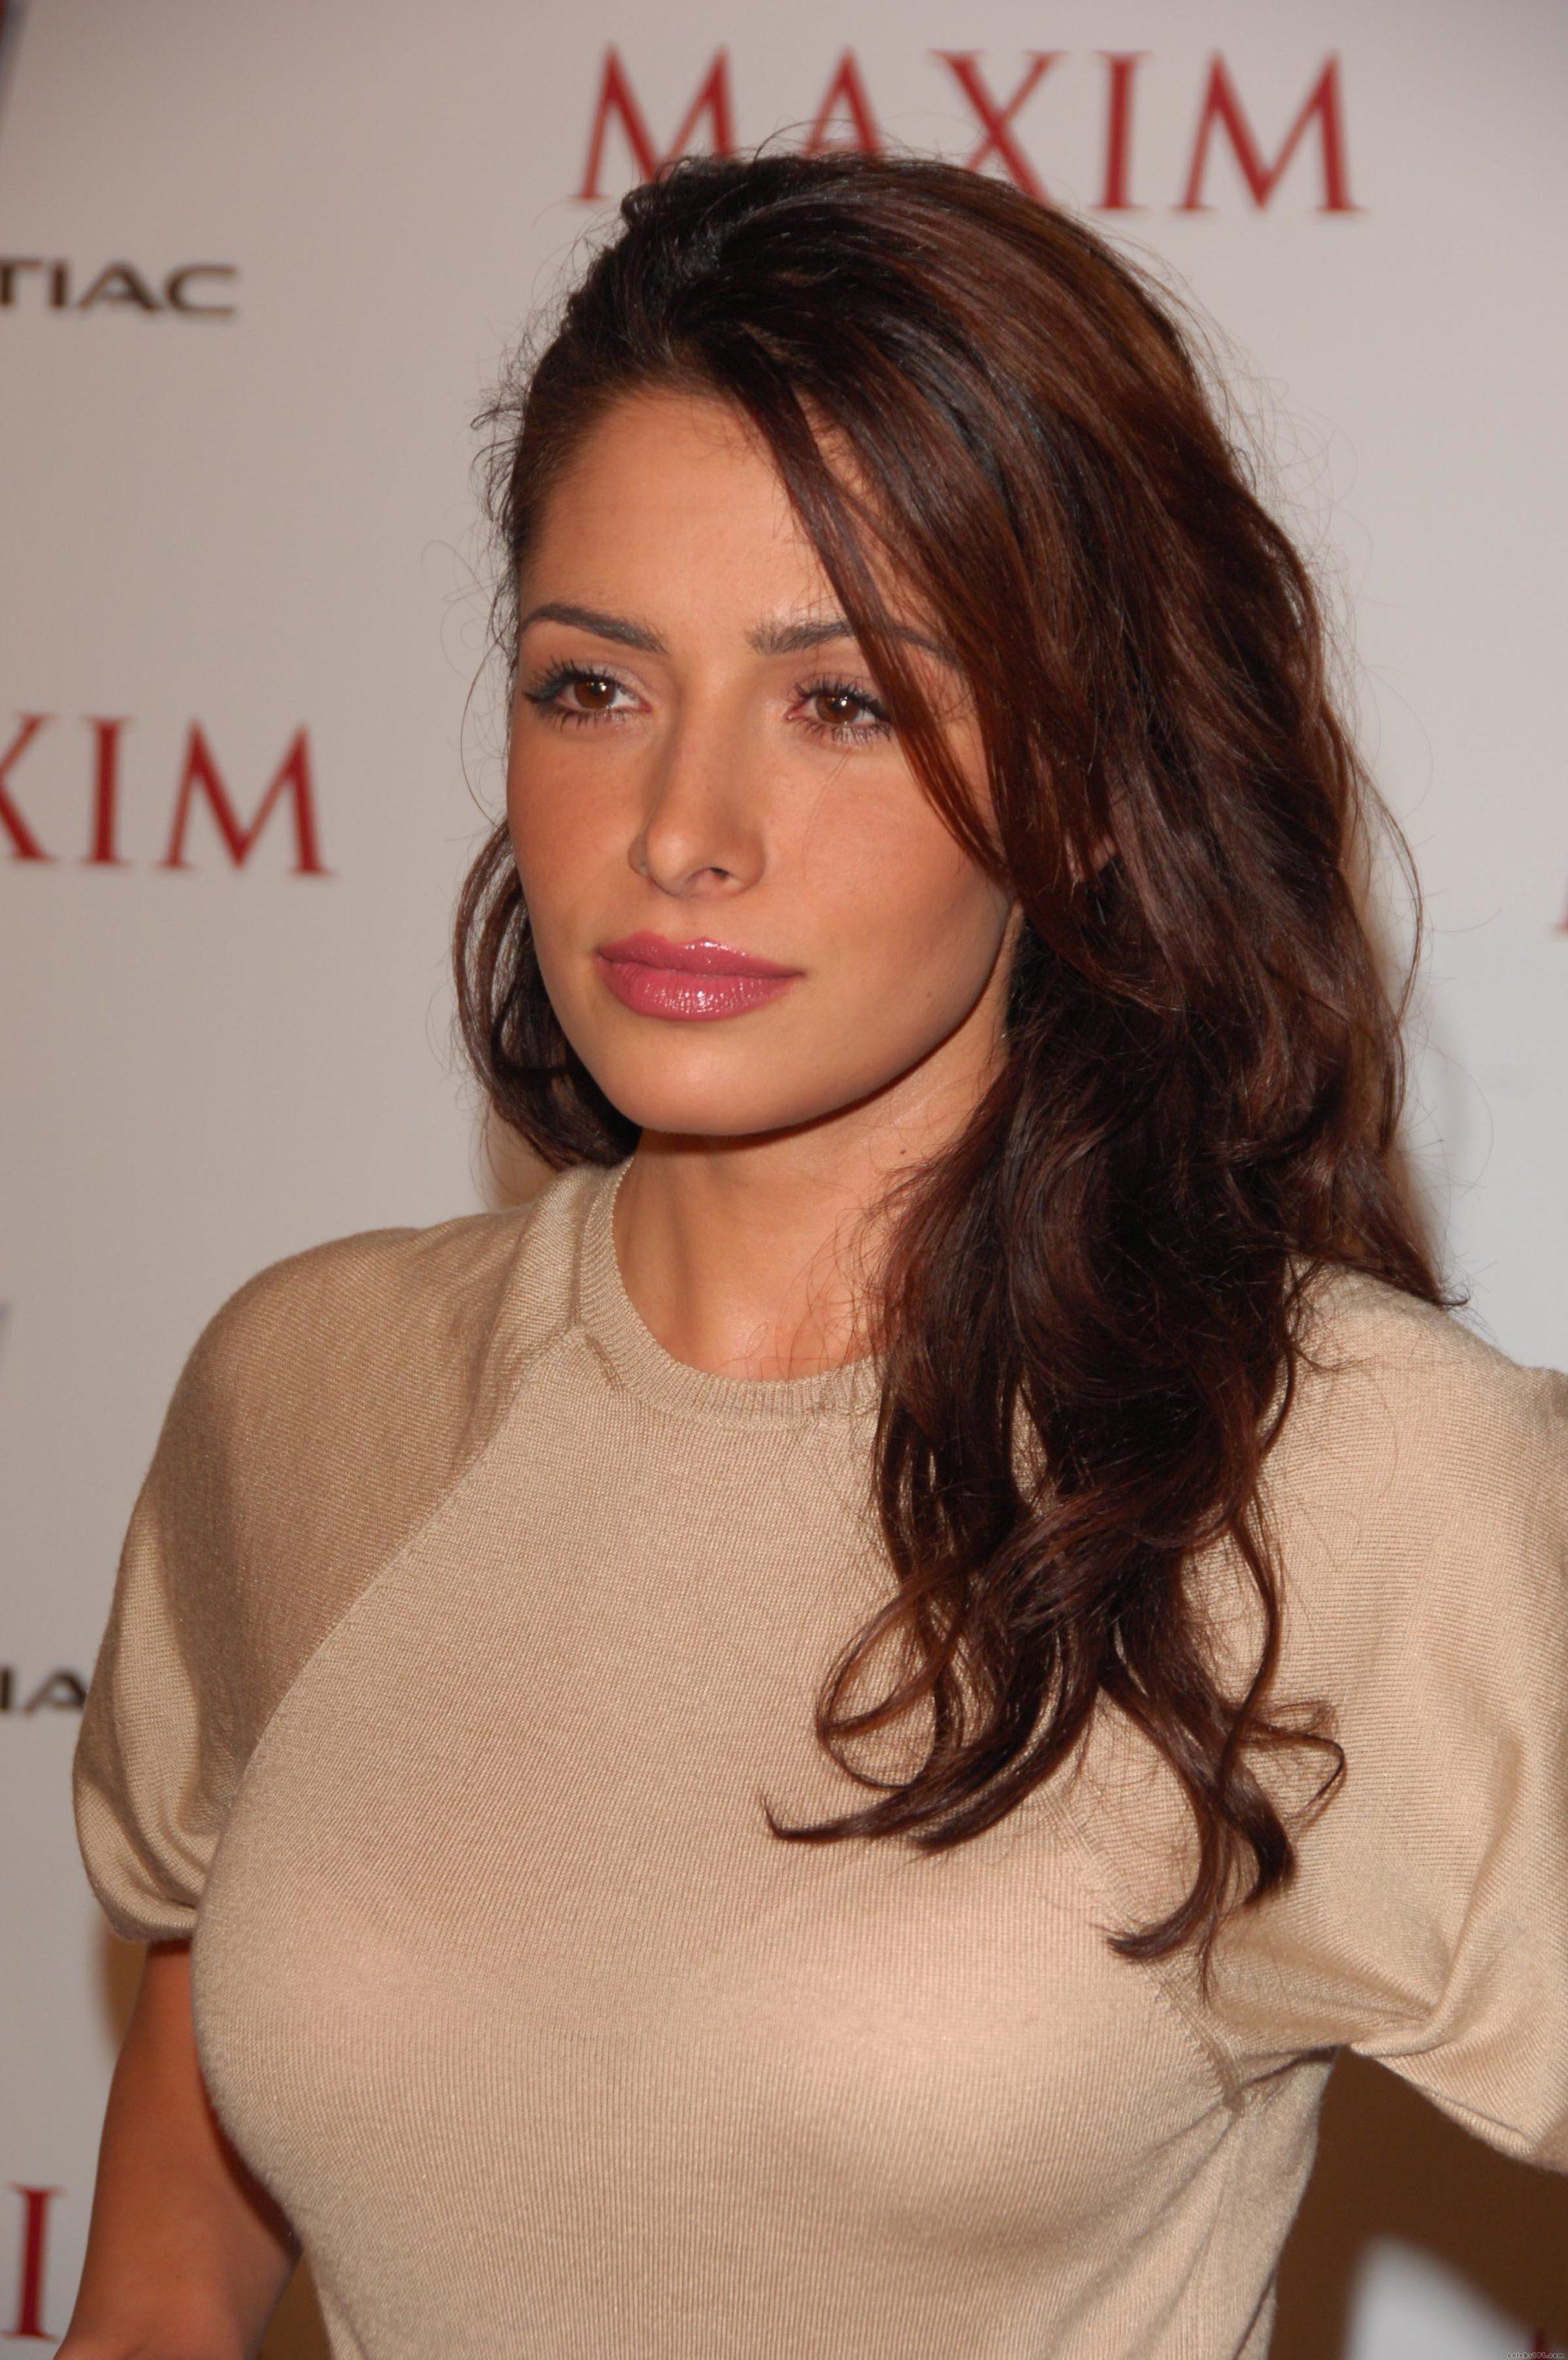 Sarah Shahi Hot Pictures & Bikini Photo You Can't Afford